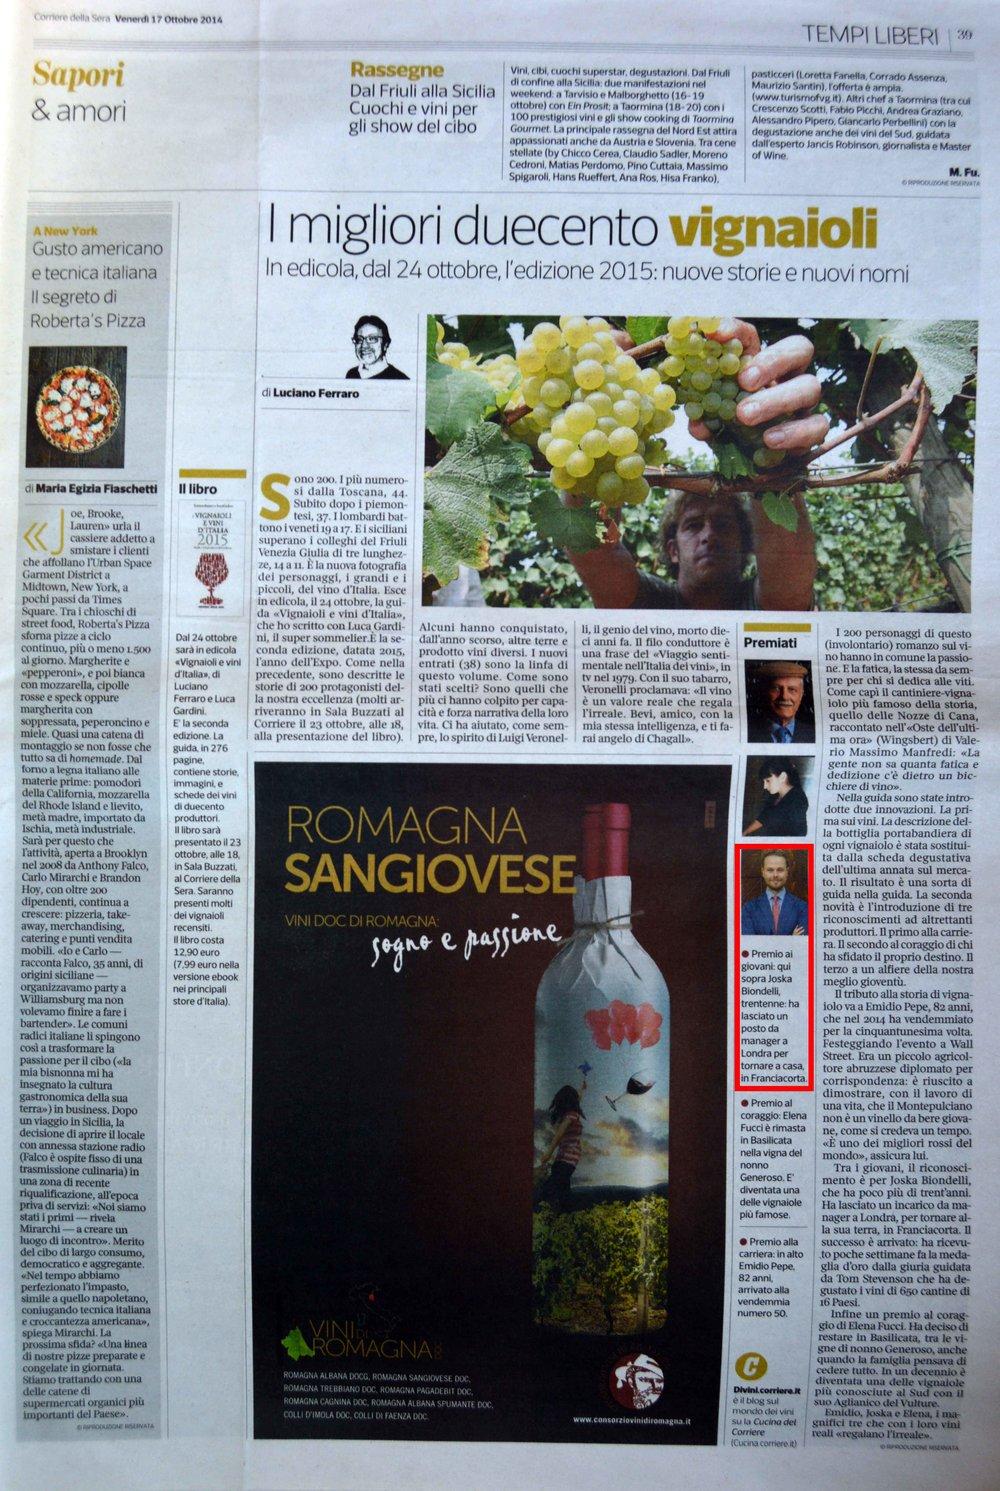 press-vinaioli.jpg